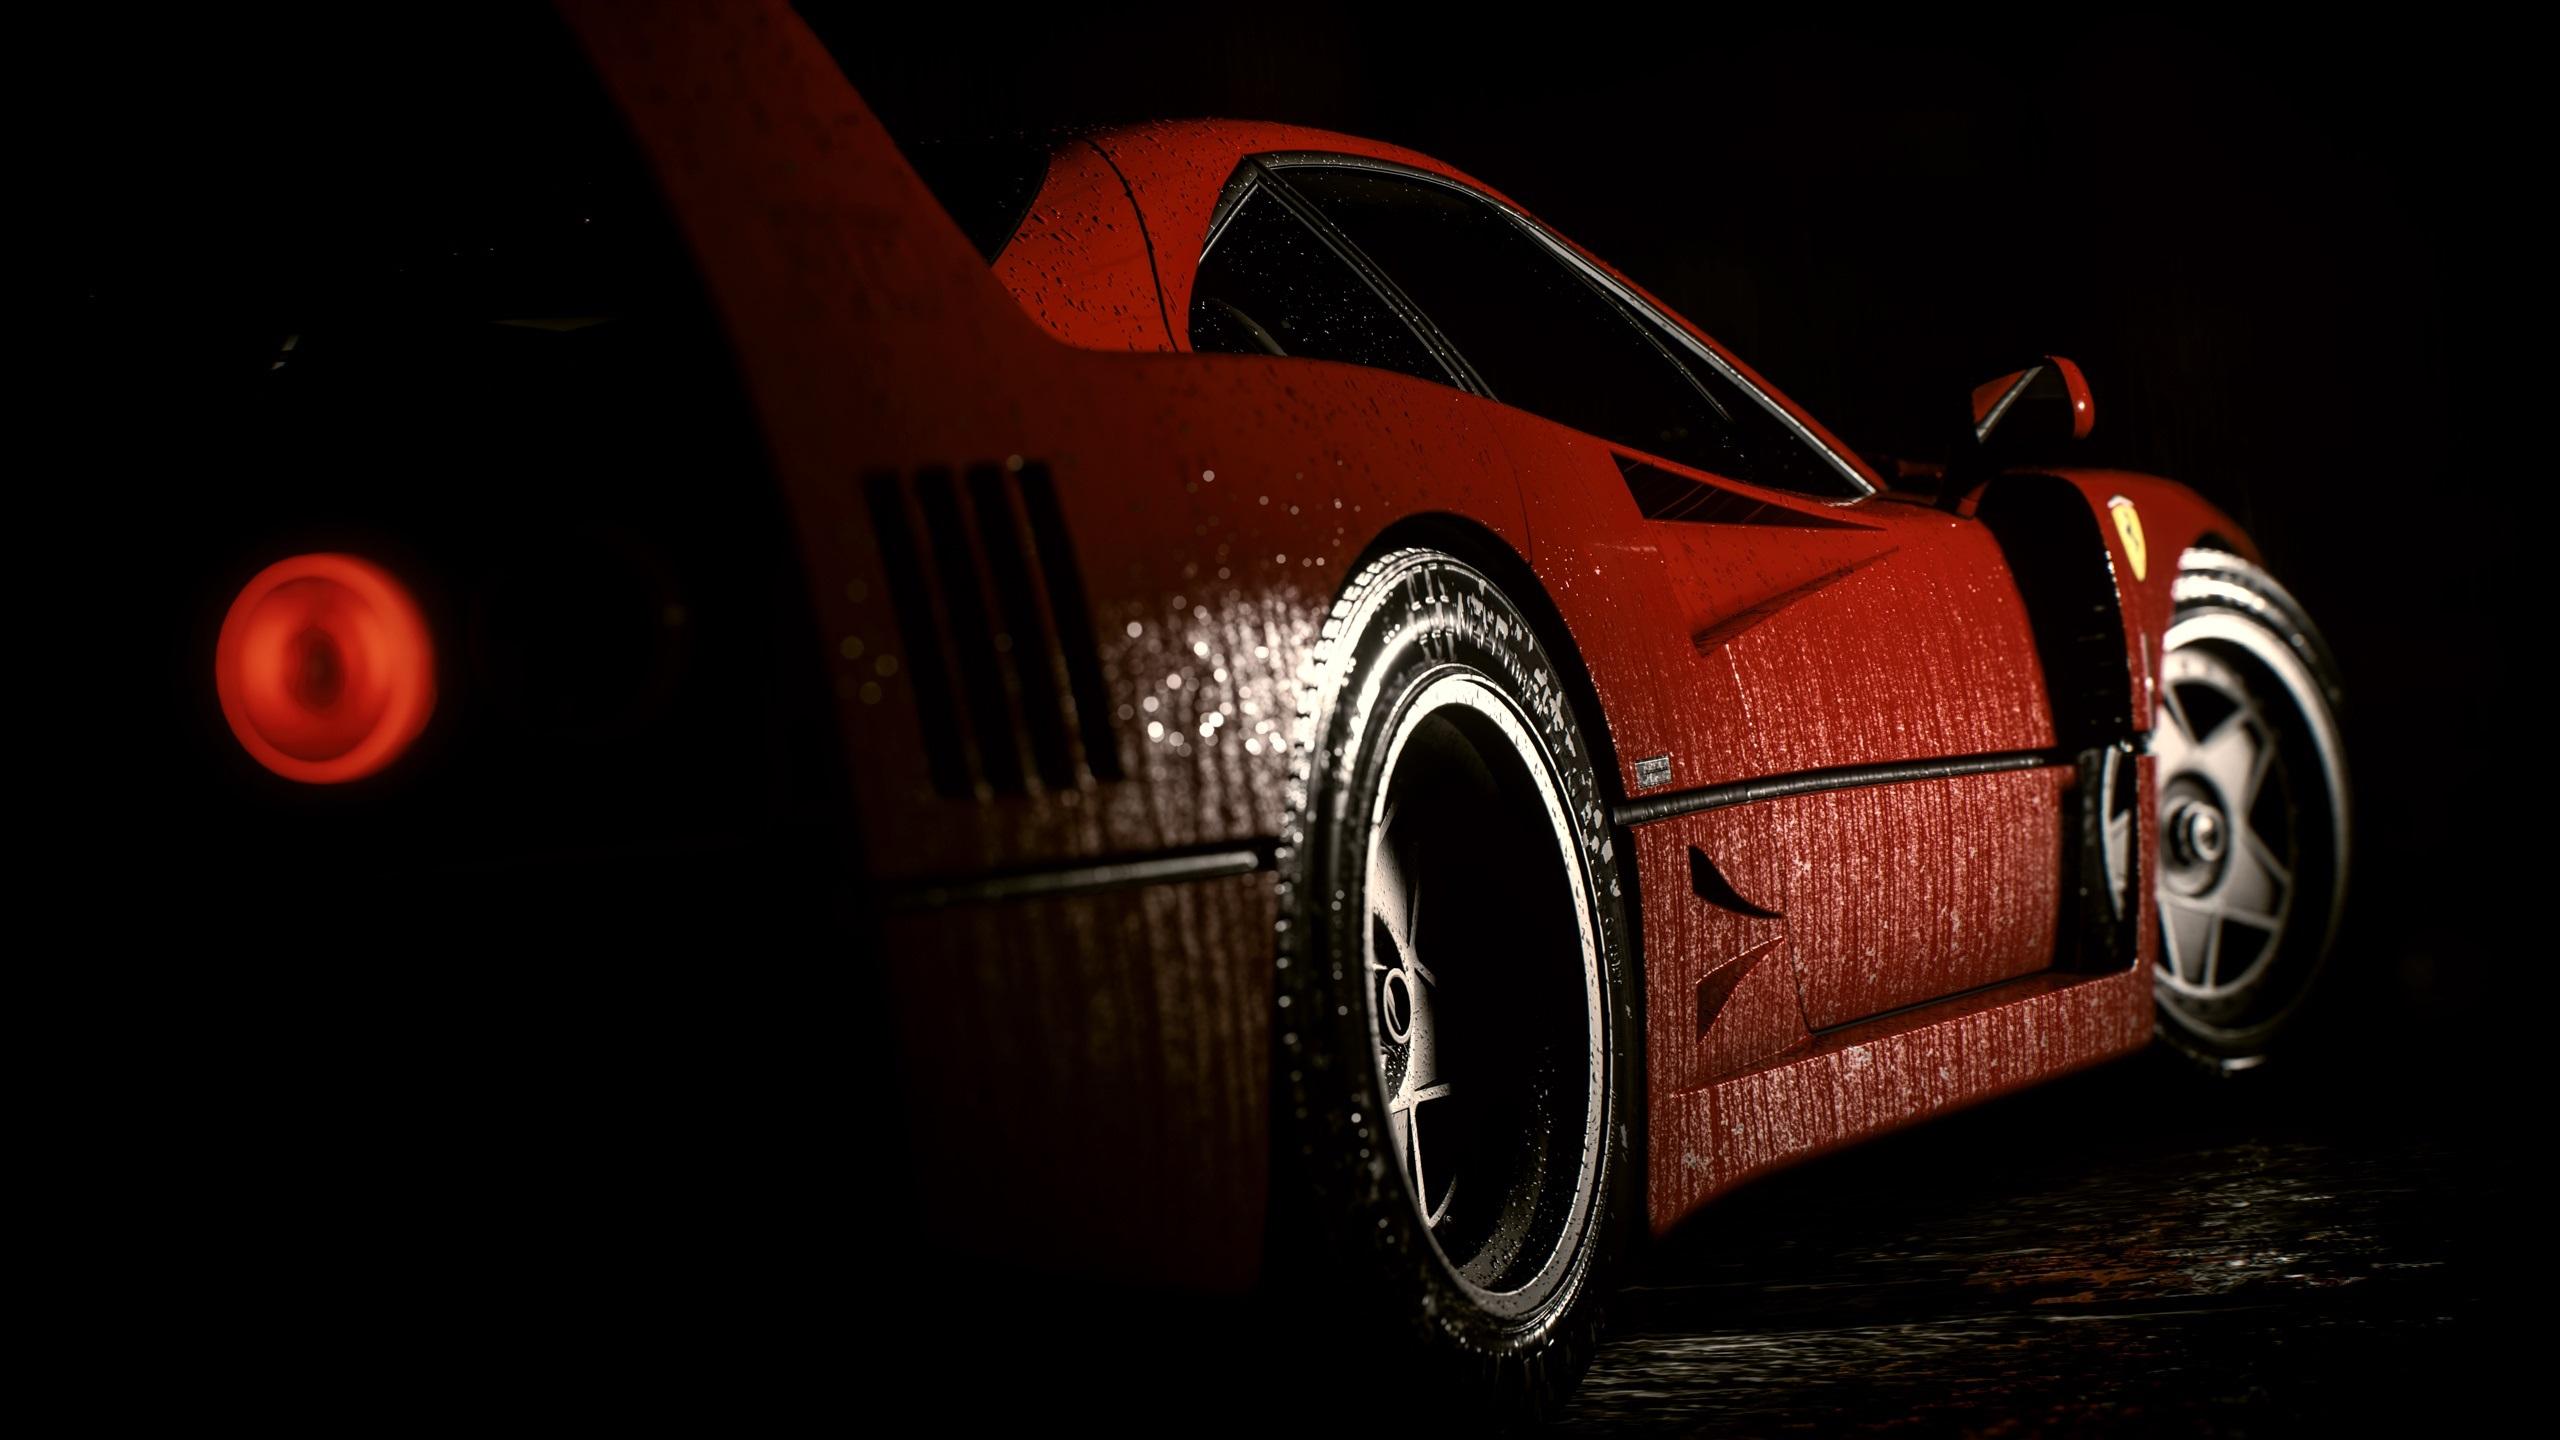 Download Wallpaper Night Ferrari - Red-Ferrari-sports-car-side-view-water-drops-night_2560x1440  Picture-869750.jpg